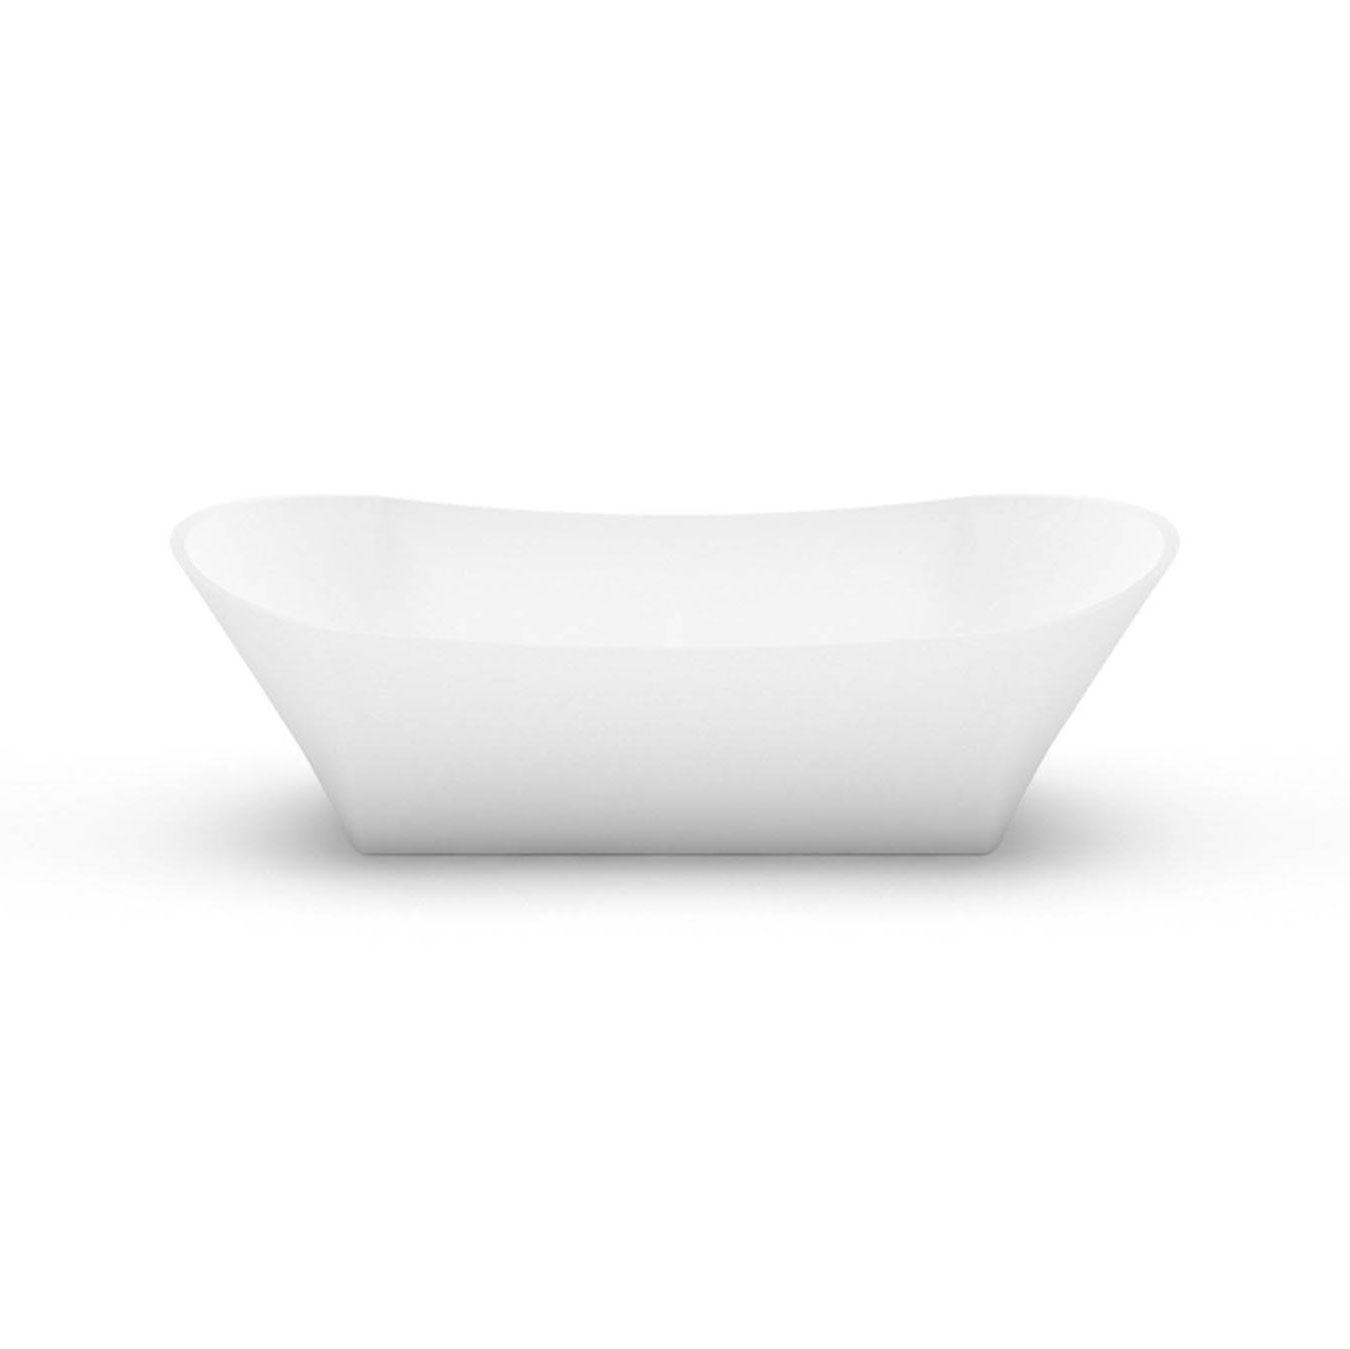 Akmens masas izlietne Belisana 1, Stone cast washbasin Belisana 1 fr